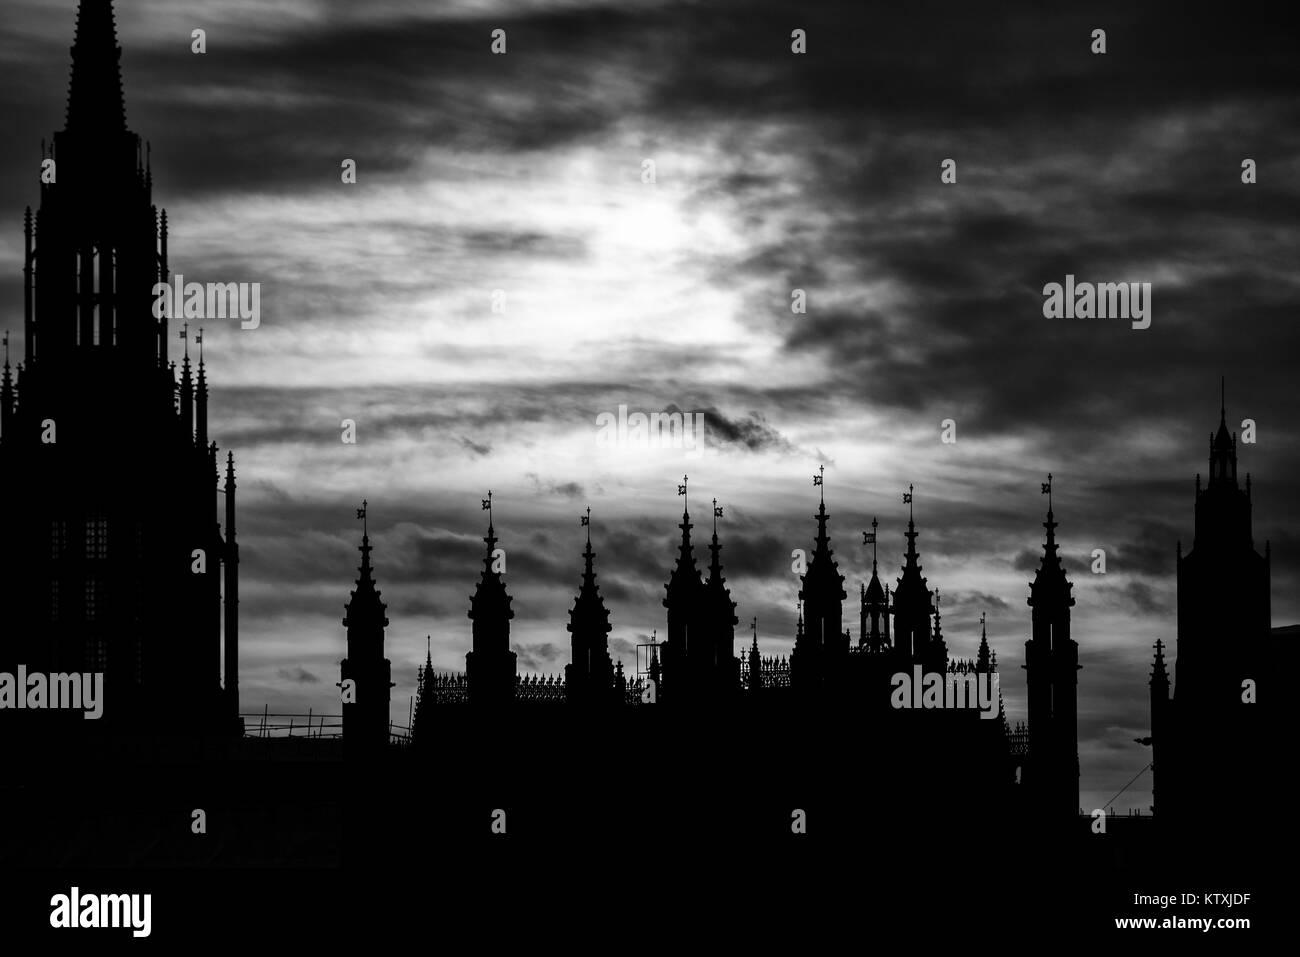 London Eye, Southbank - Stock Image